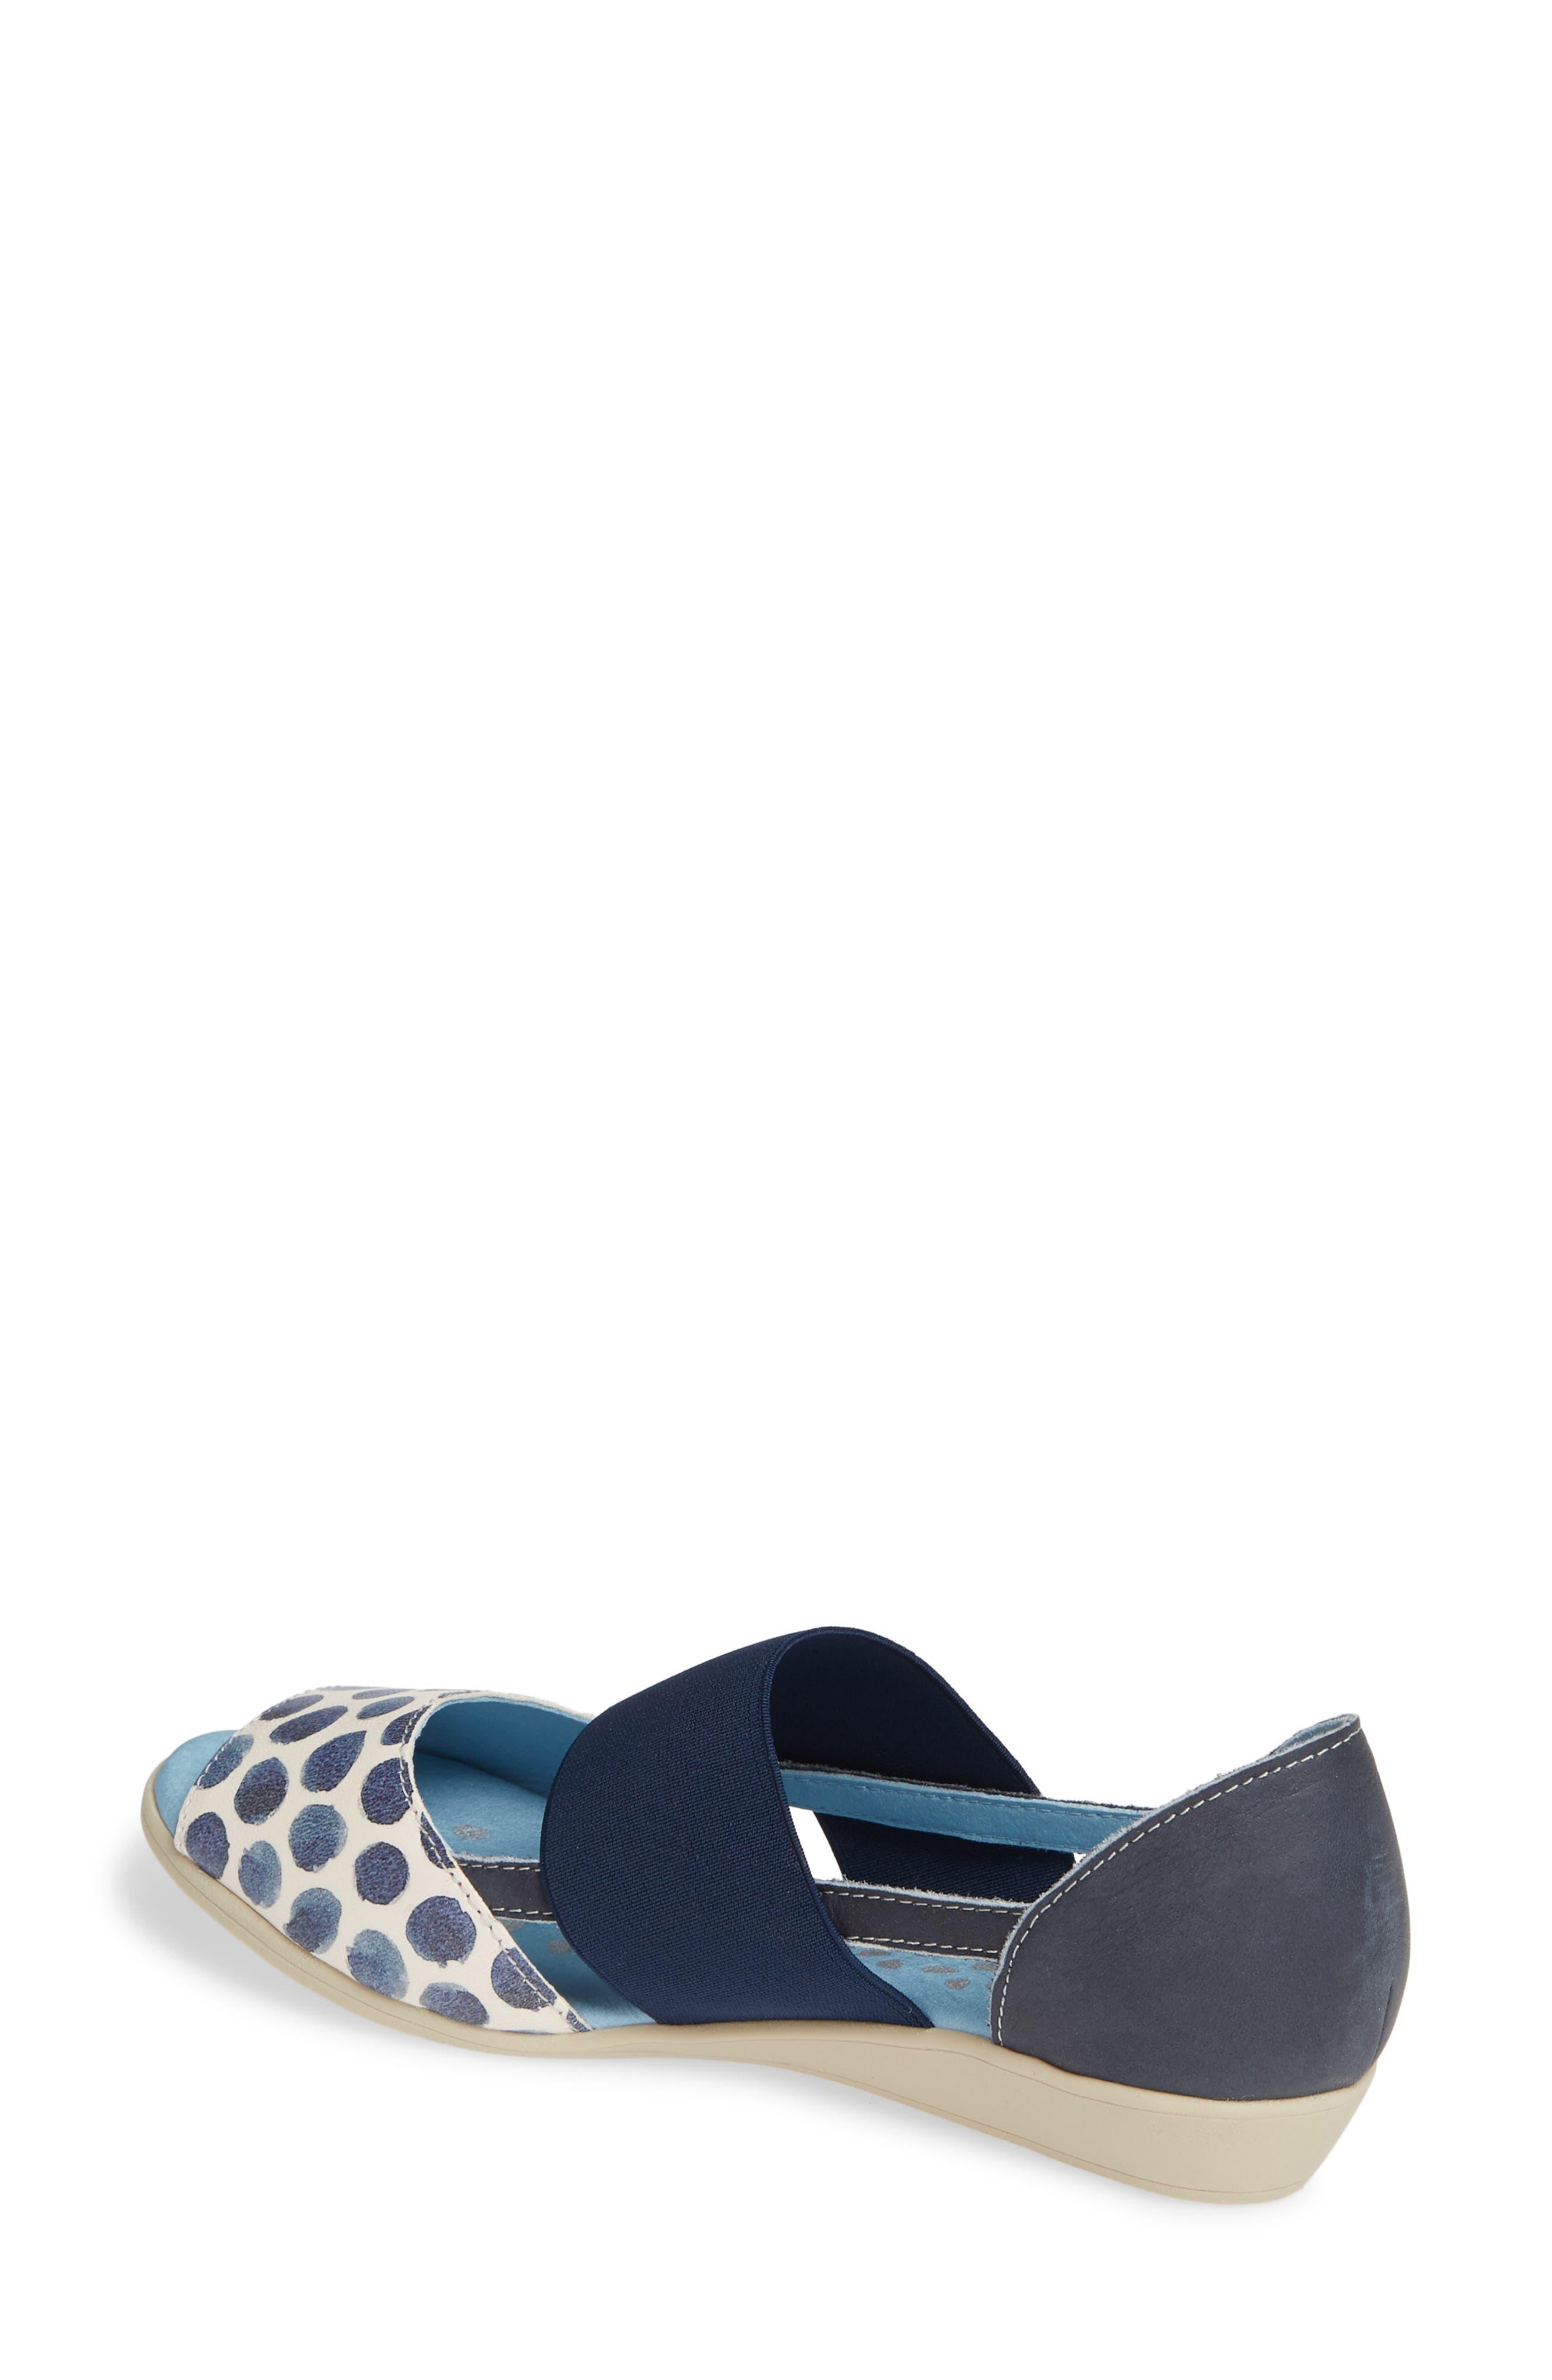 CLOUD,                             'Canary' Skimmer Sandal,                             Alternate thumbnail 2, color,                             TUPAI BLUE LEATHER